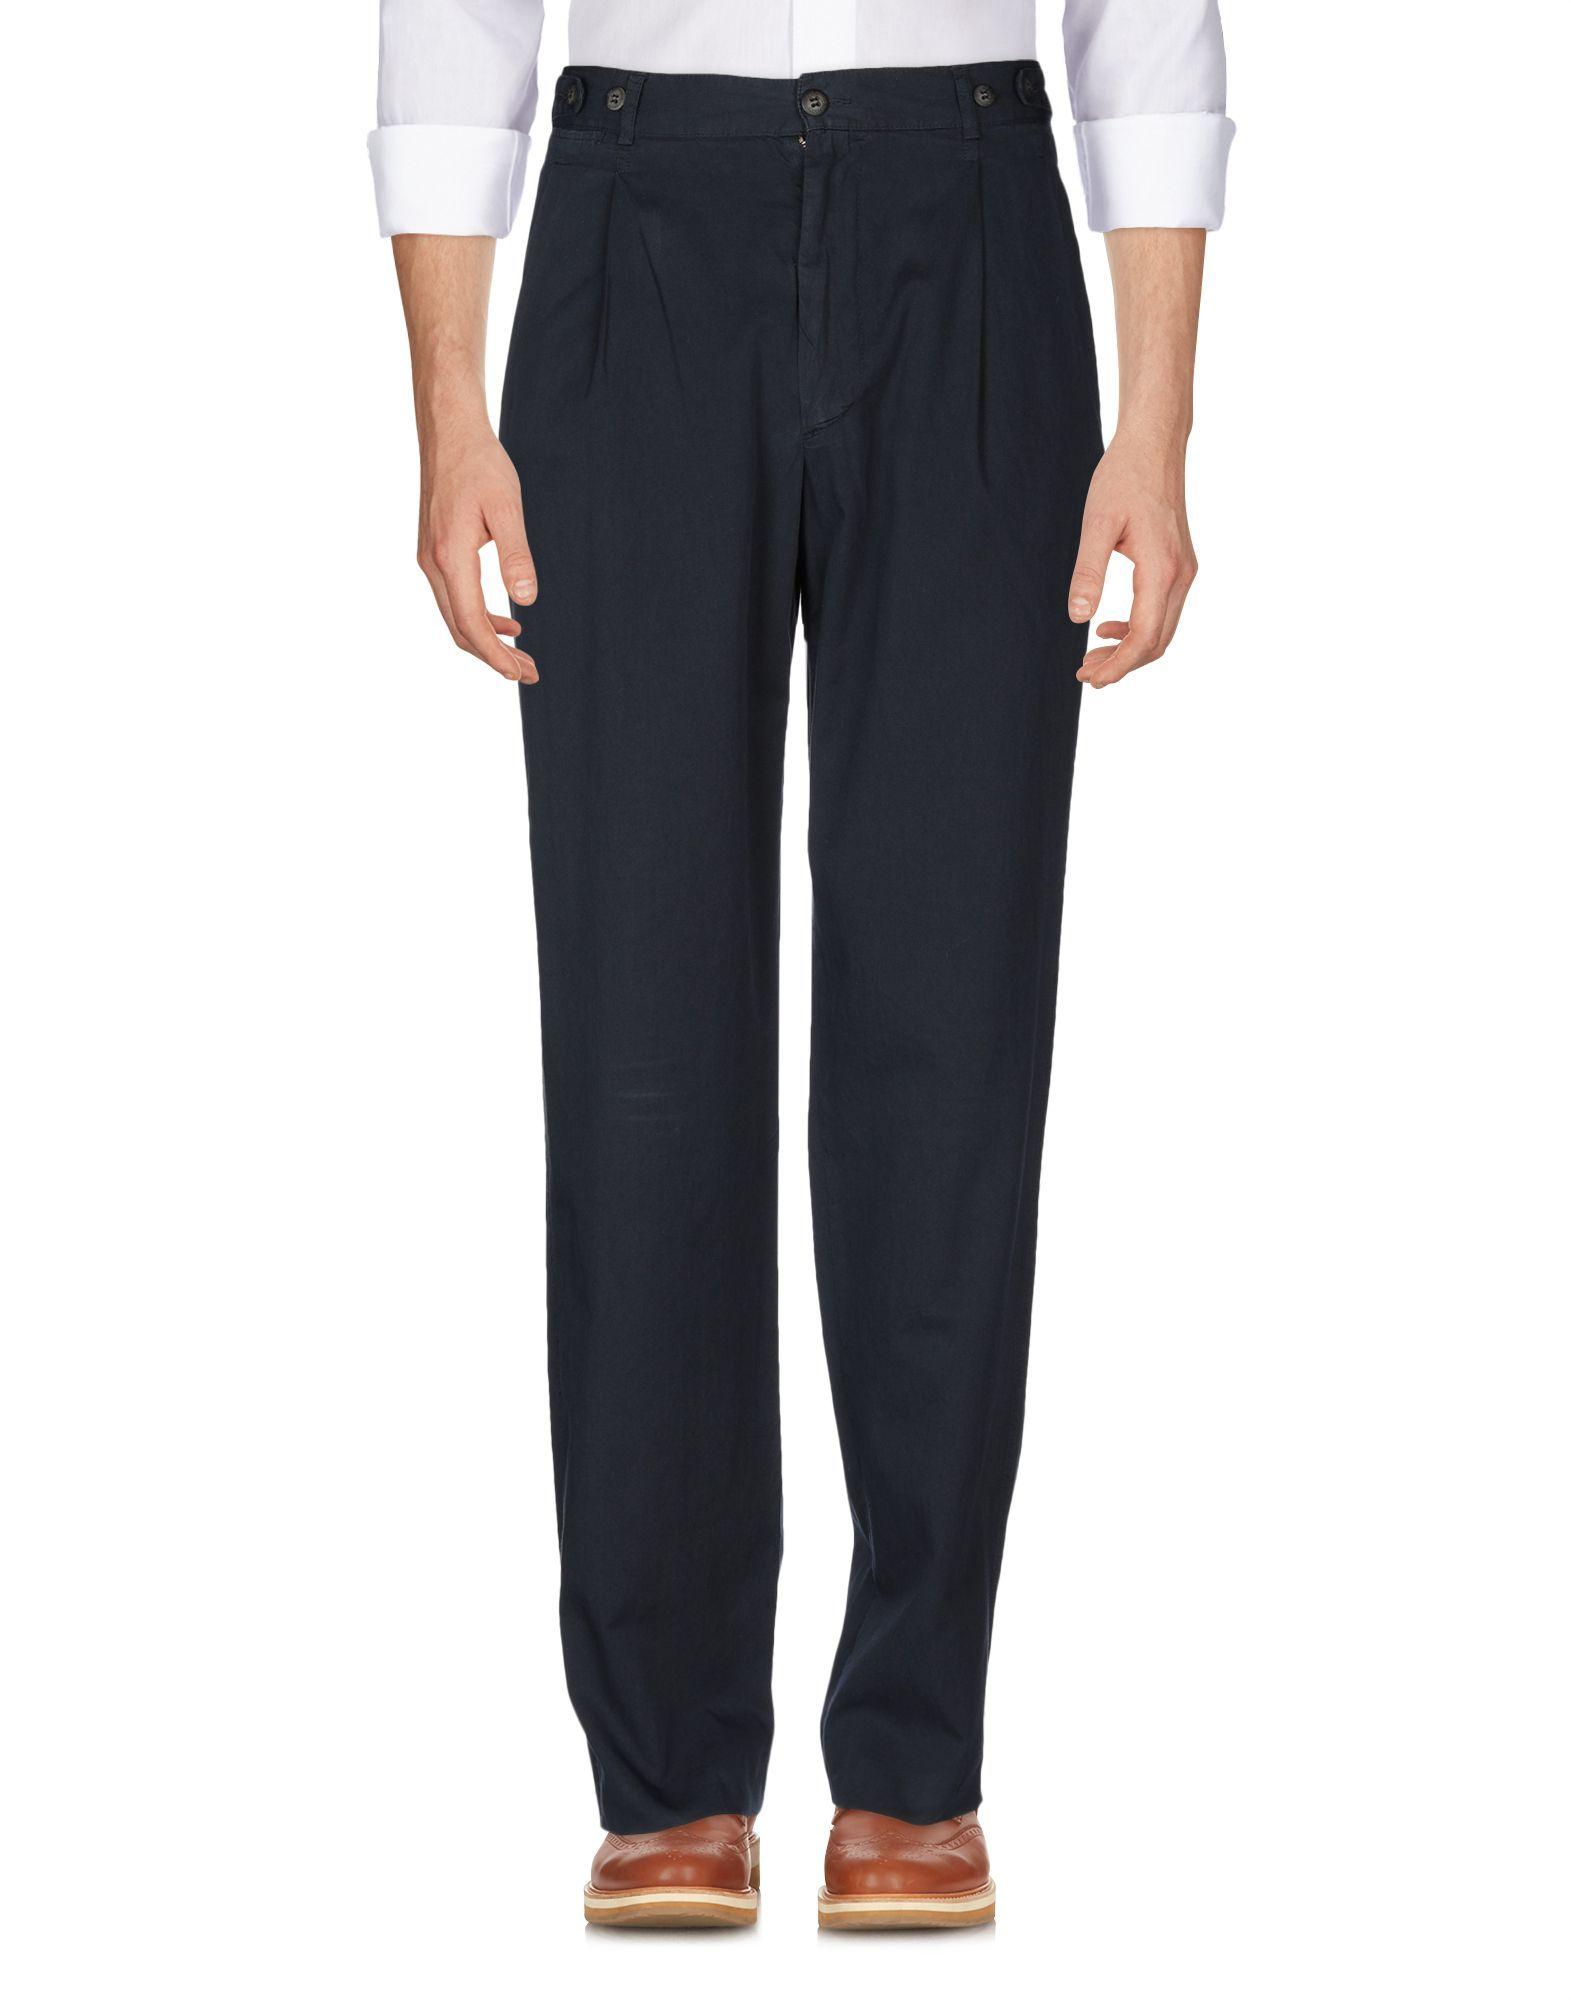 Henry Cotton's Dark Blue Cotton Trousers